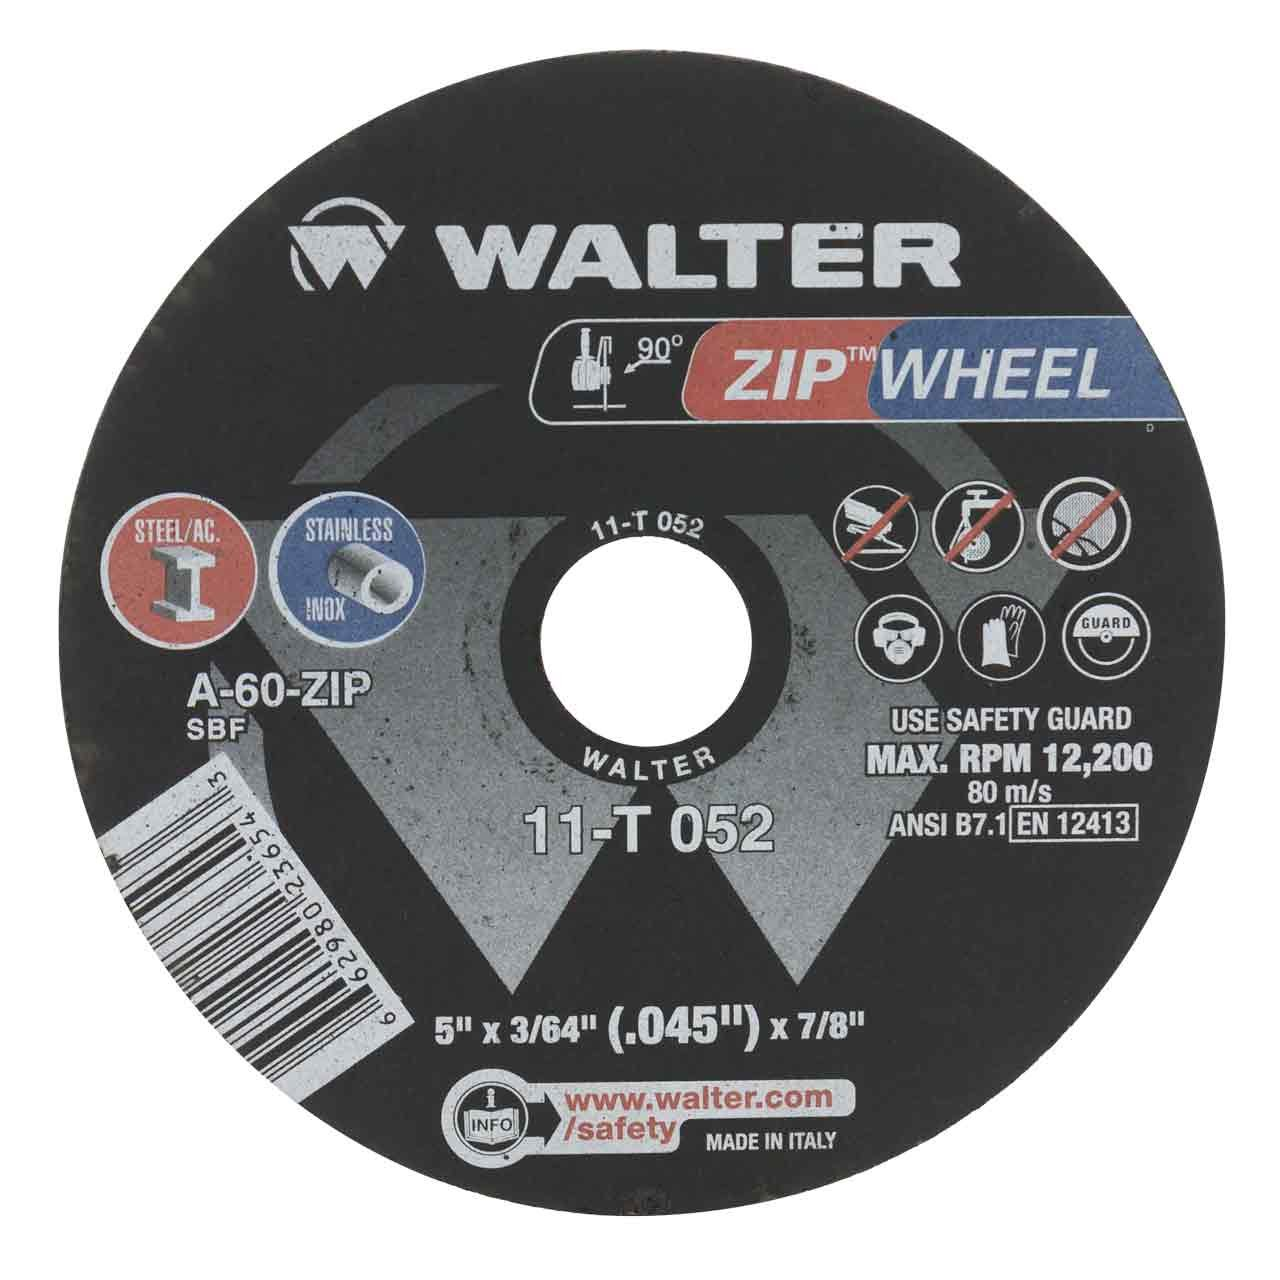 Walter 11T052 5x3/64x7/8 High Performance Zip Wheels Type 1 A60 Grit |